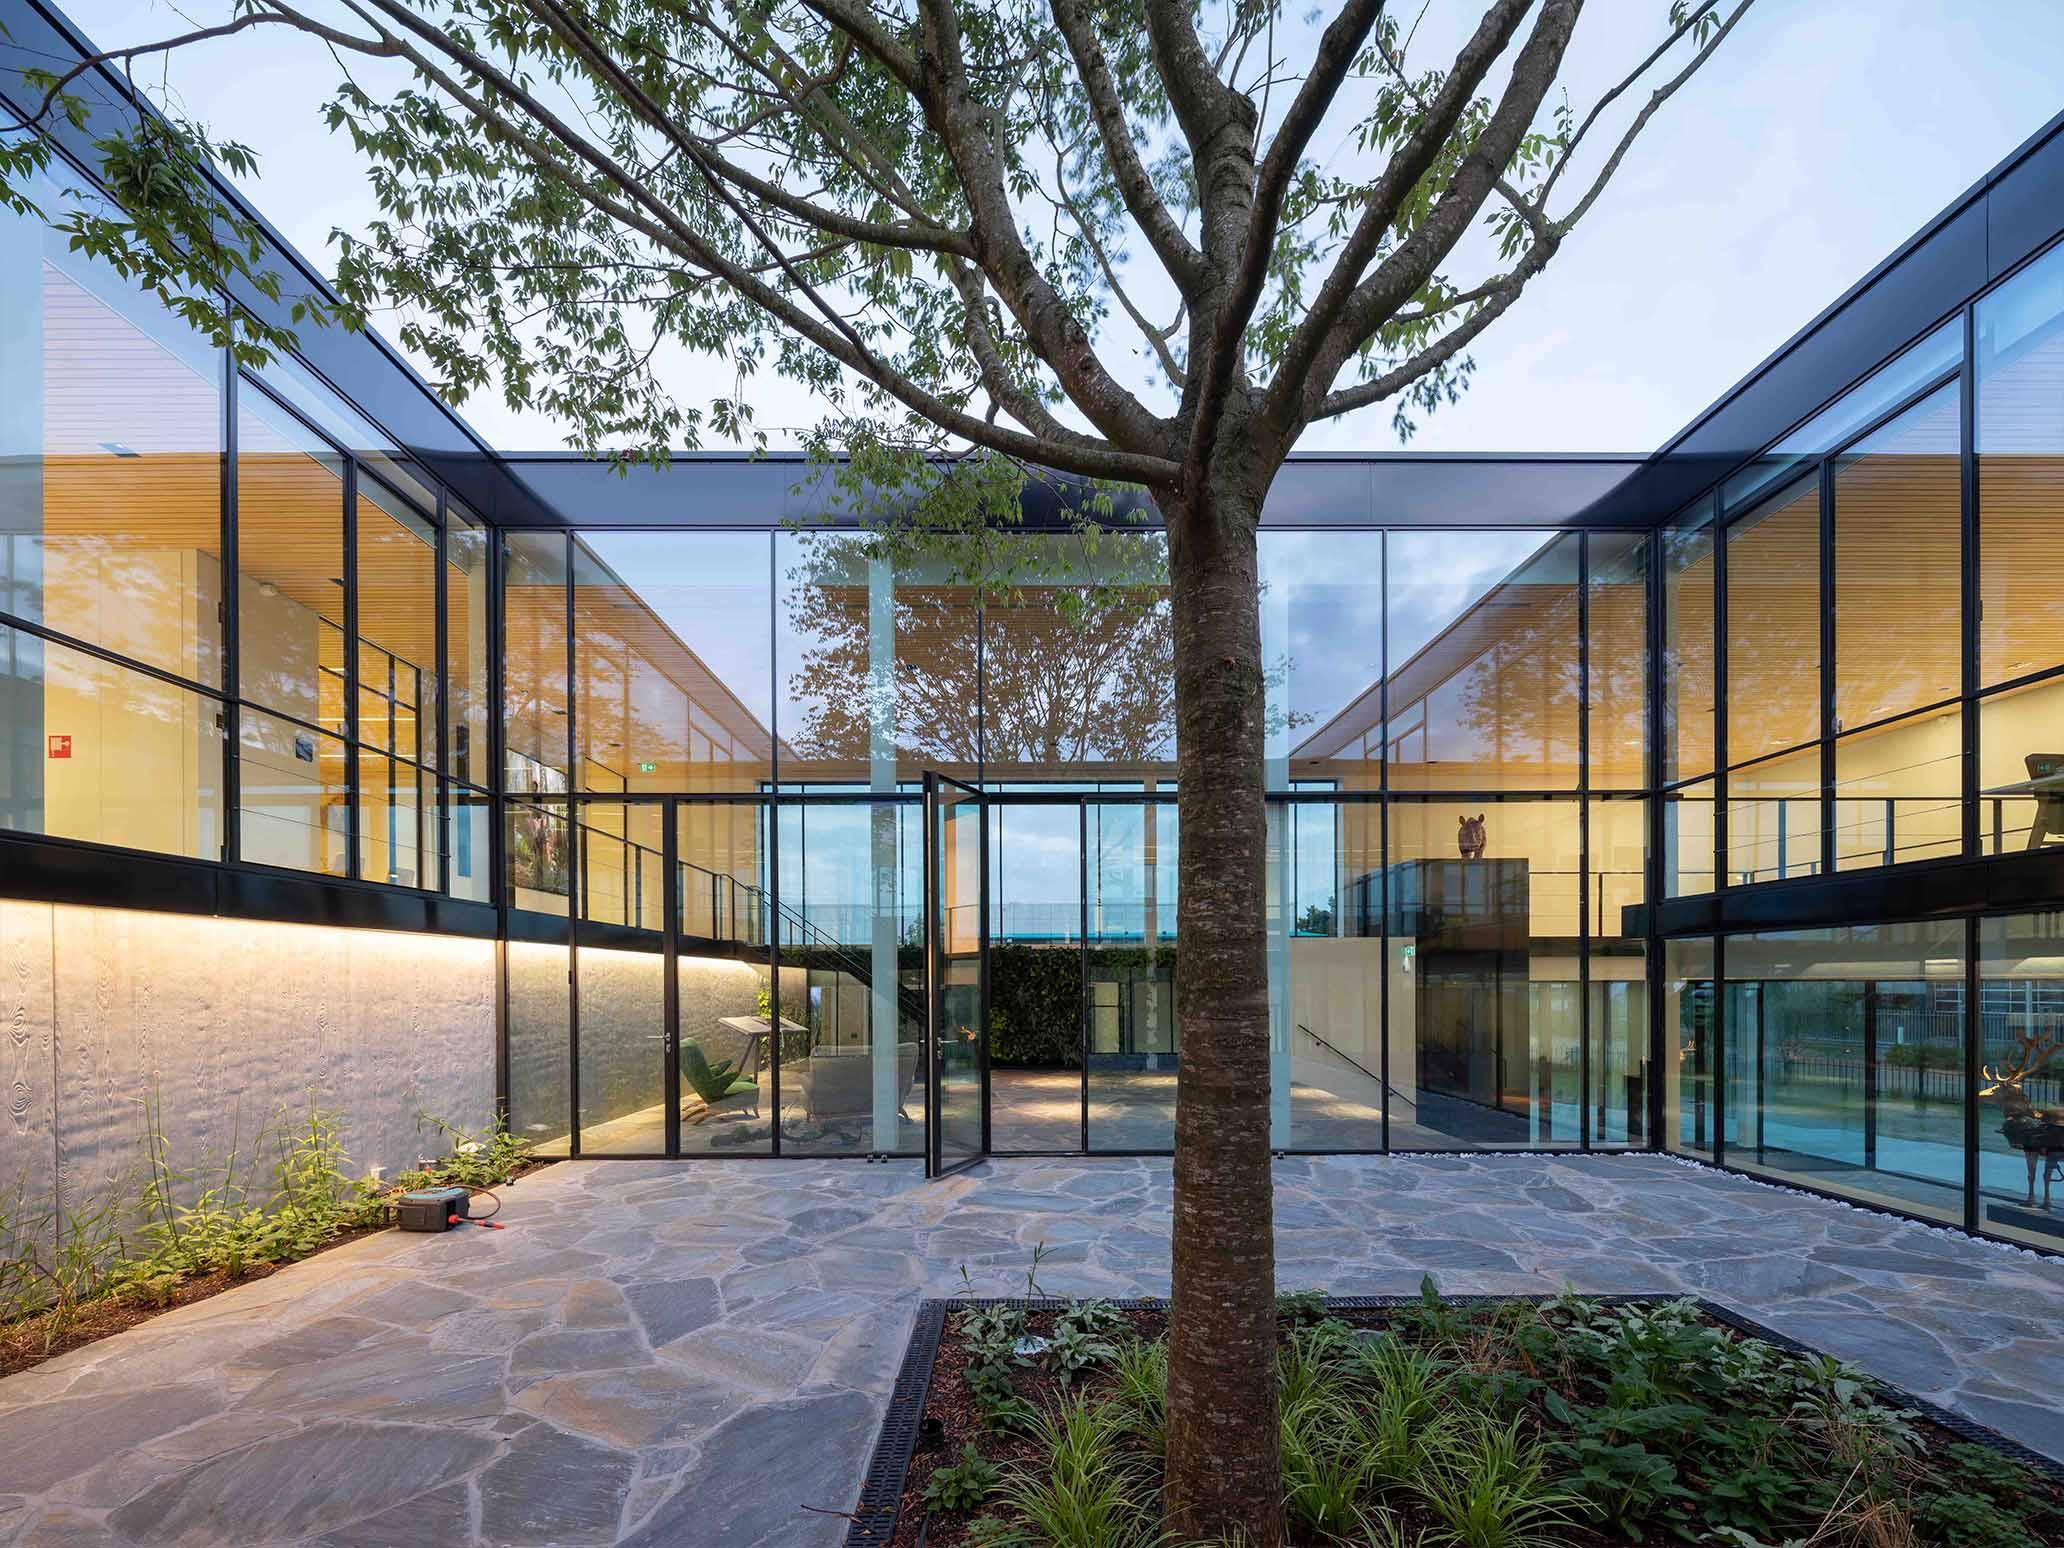 dolphin quays residential developement using aluminium framed glazing with aluminium windows